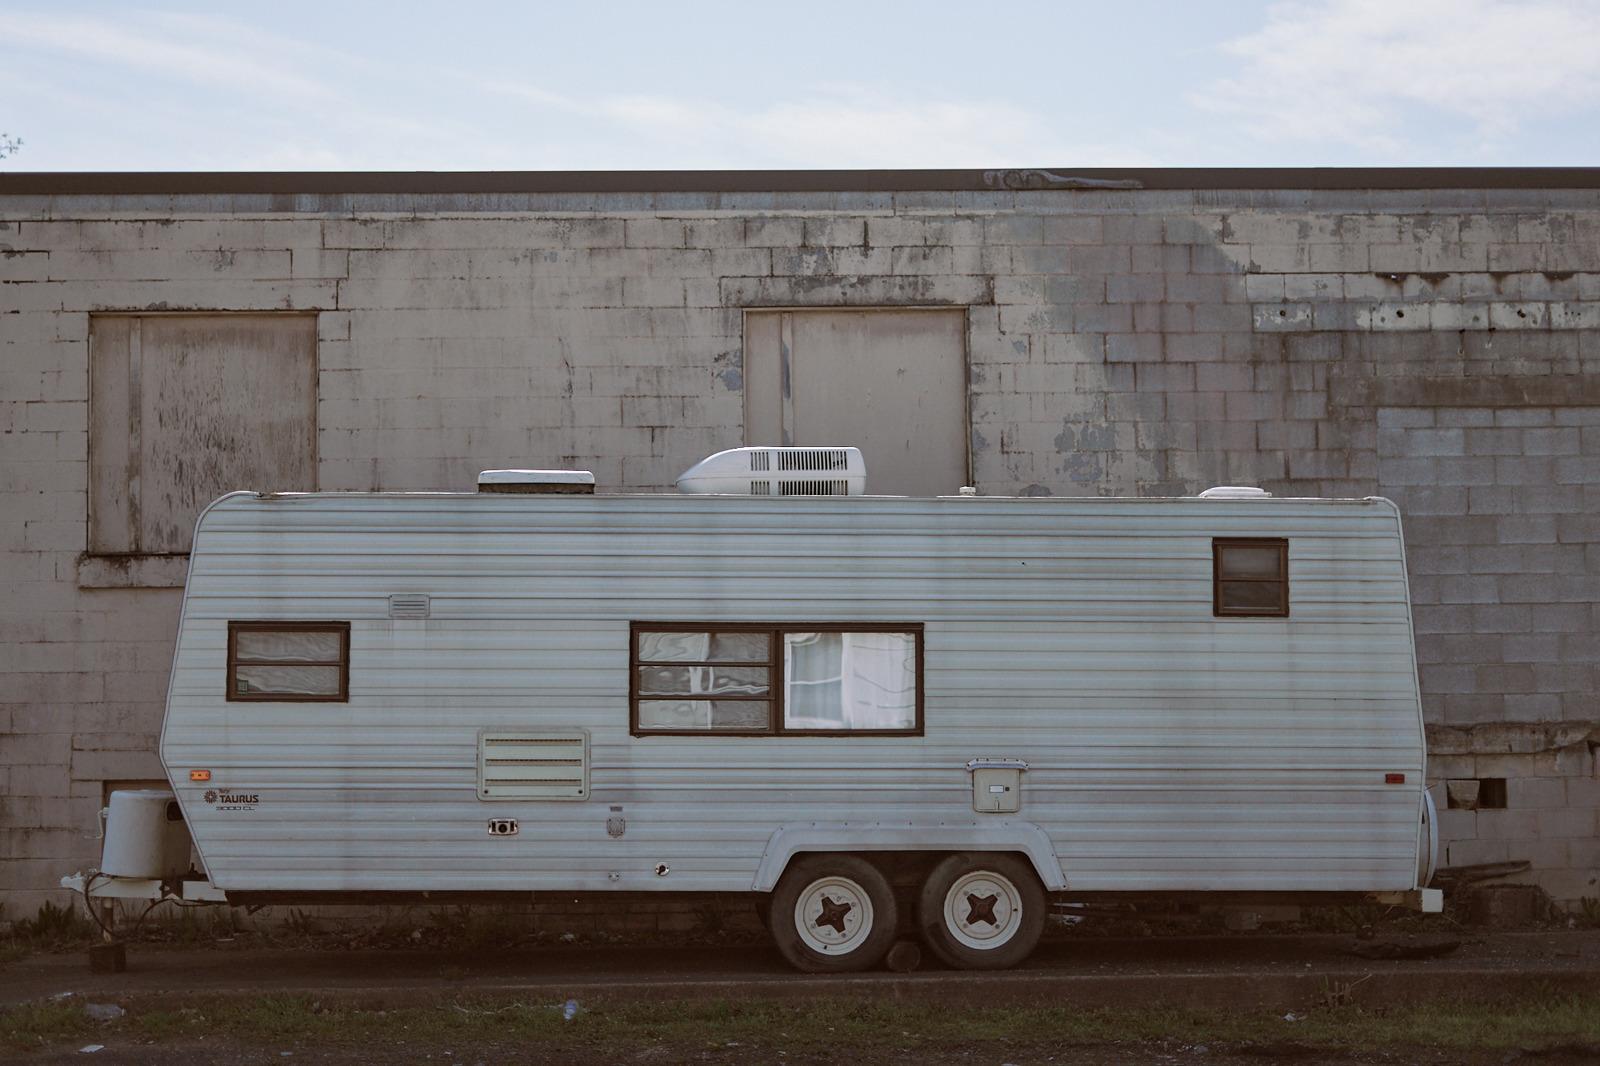 RV, travel trailer, Mechanicsburg, Pennsylvania, street photography